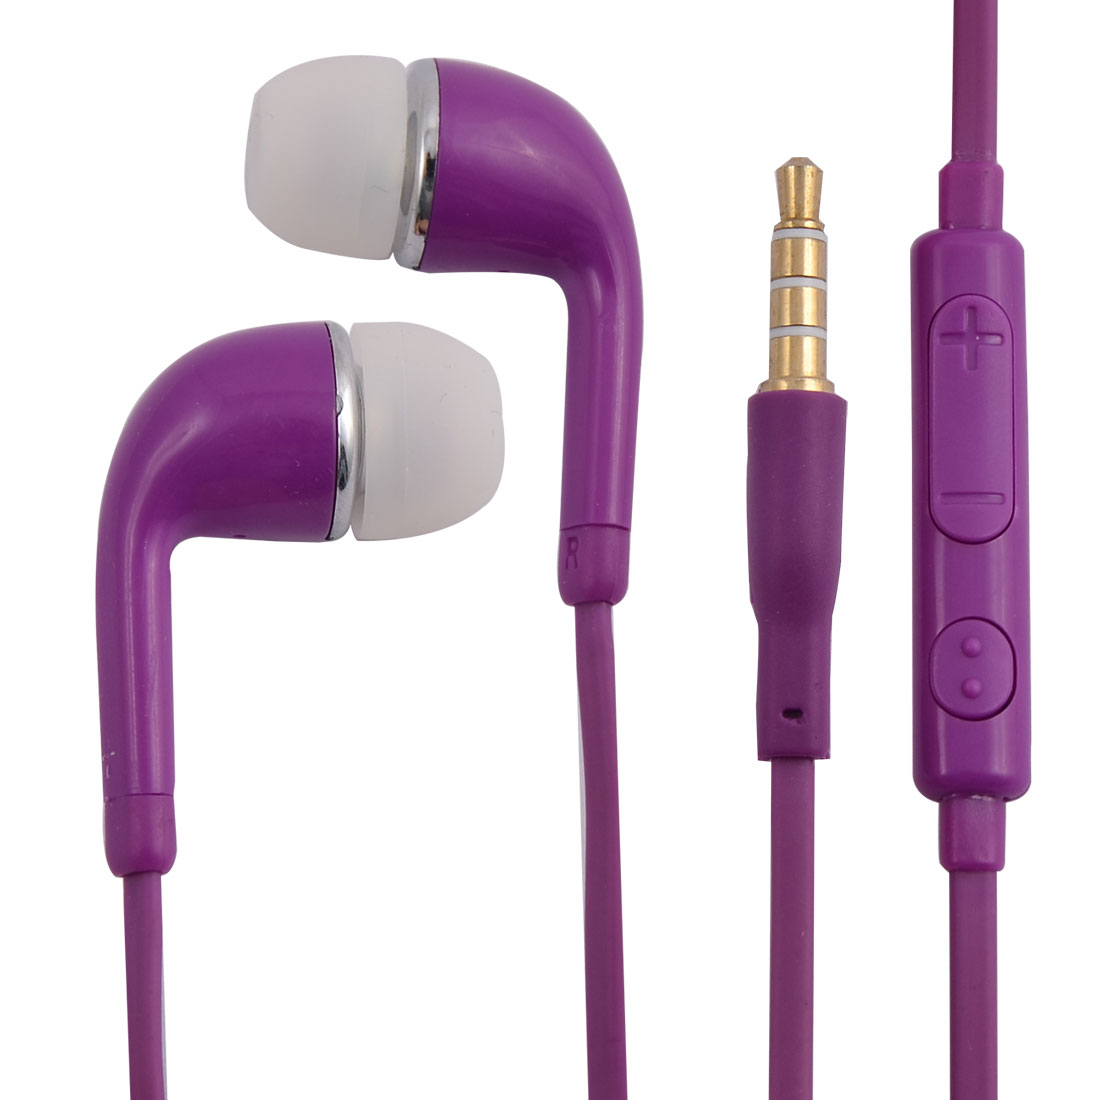 3.5mm Stereo In-Ear Earphones Headsets Earbuds Purple for Smartphone